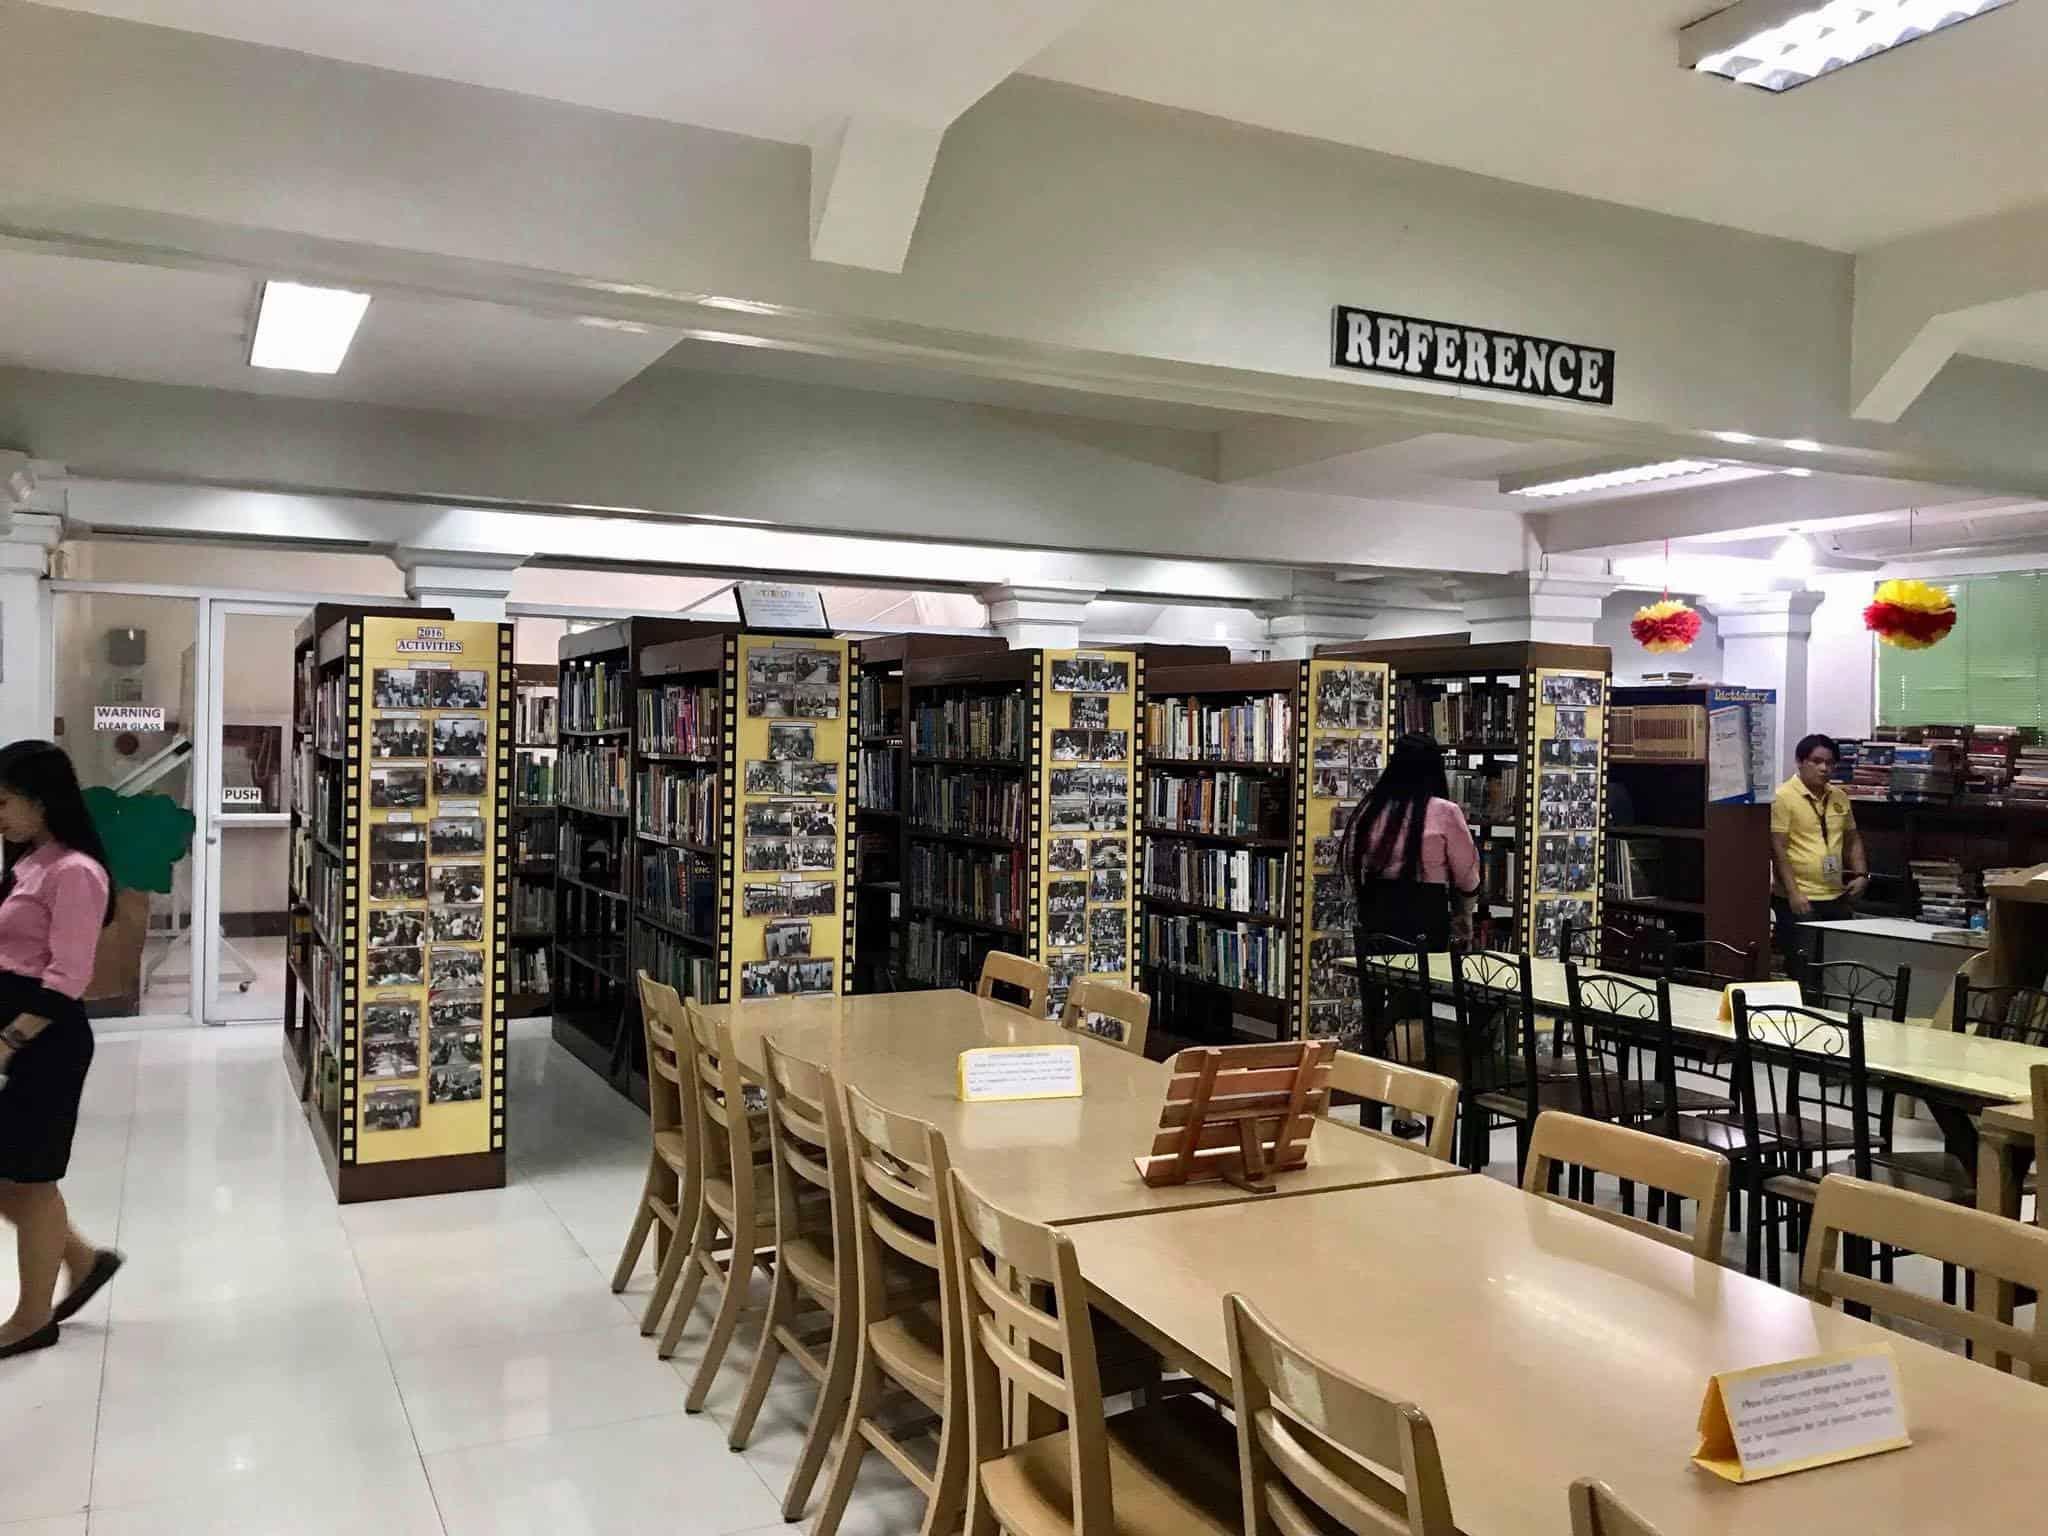 Cebu City Public Library 24 hours (2)